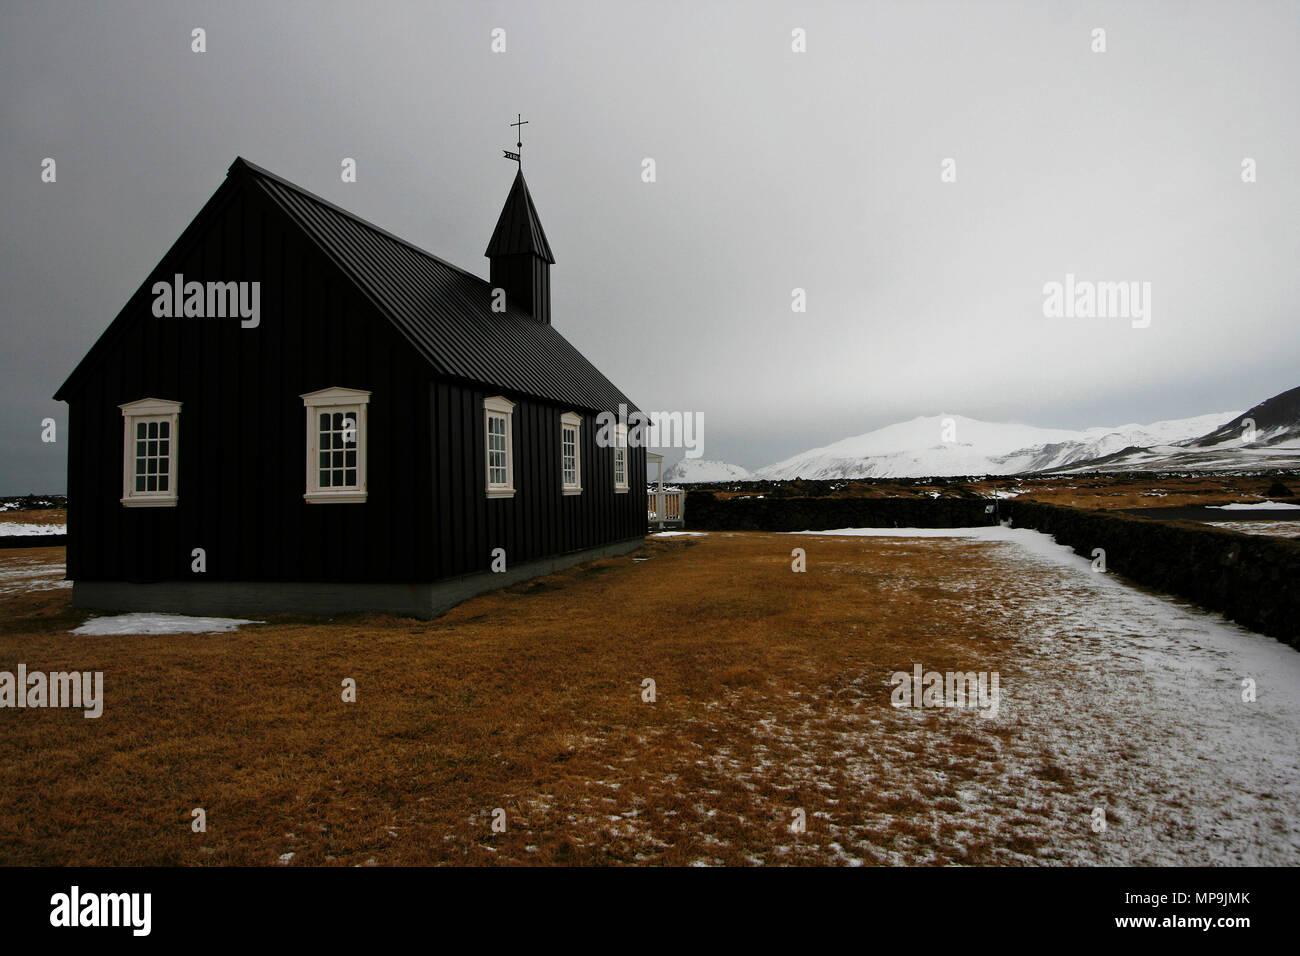 Church in Budir. Arnarstapi, Snaefellsnes peninsula, Iceland - Stock Image